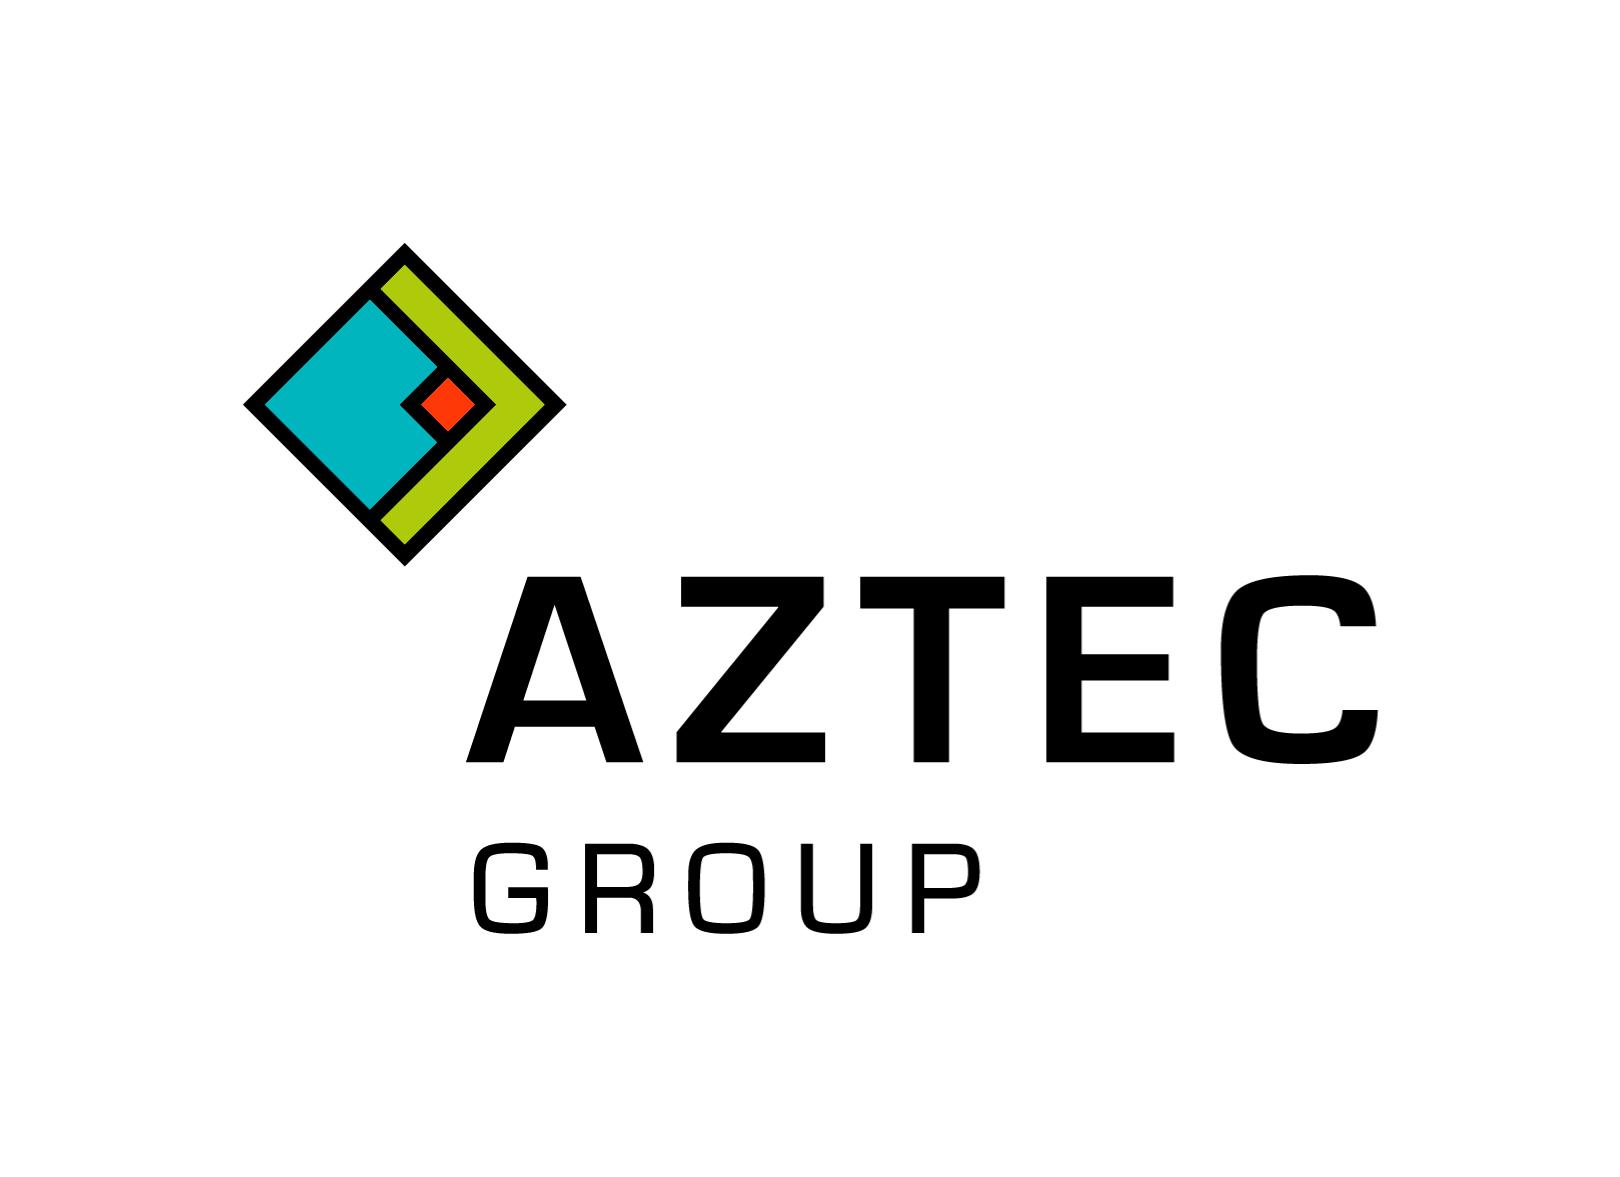 Aztec Group